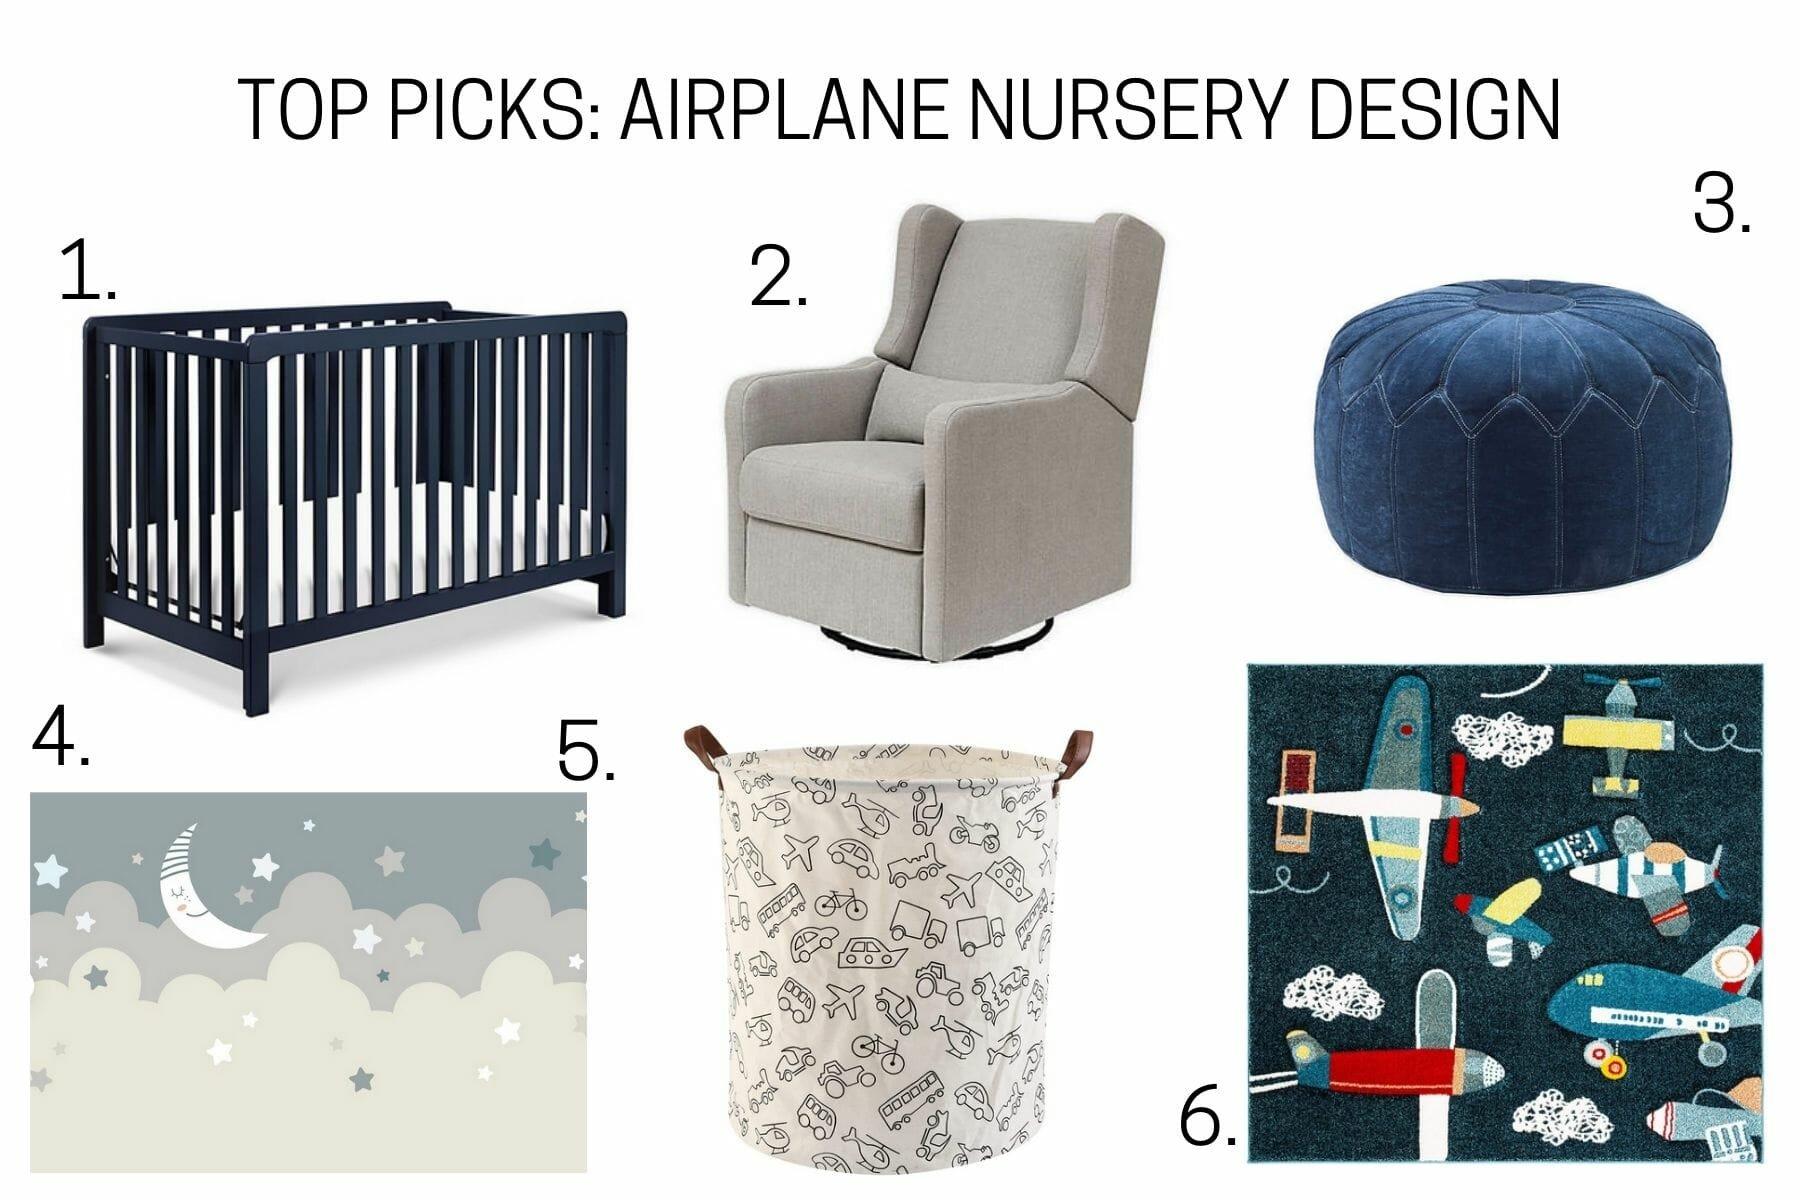 Airplane nursery design top picks